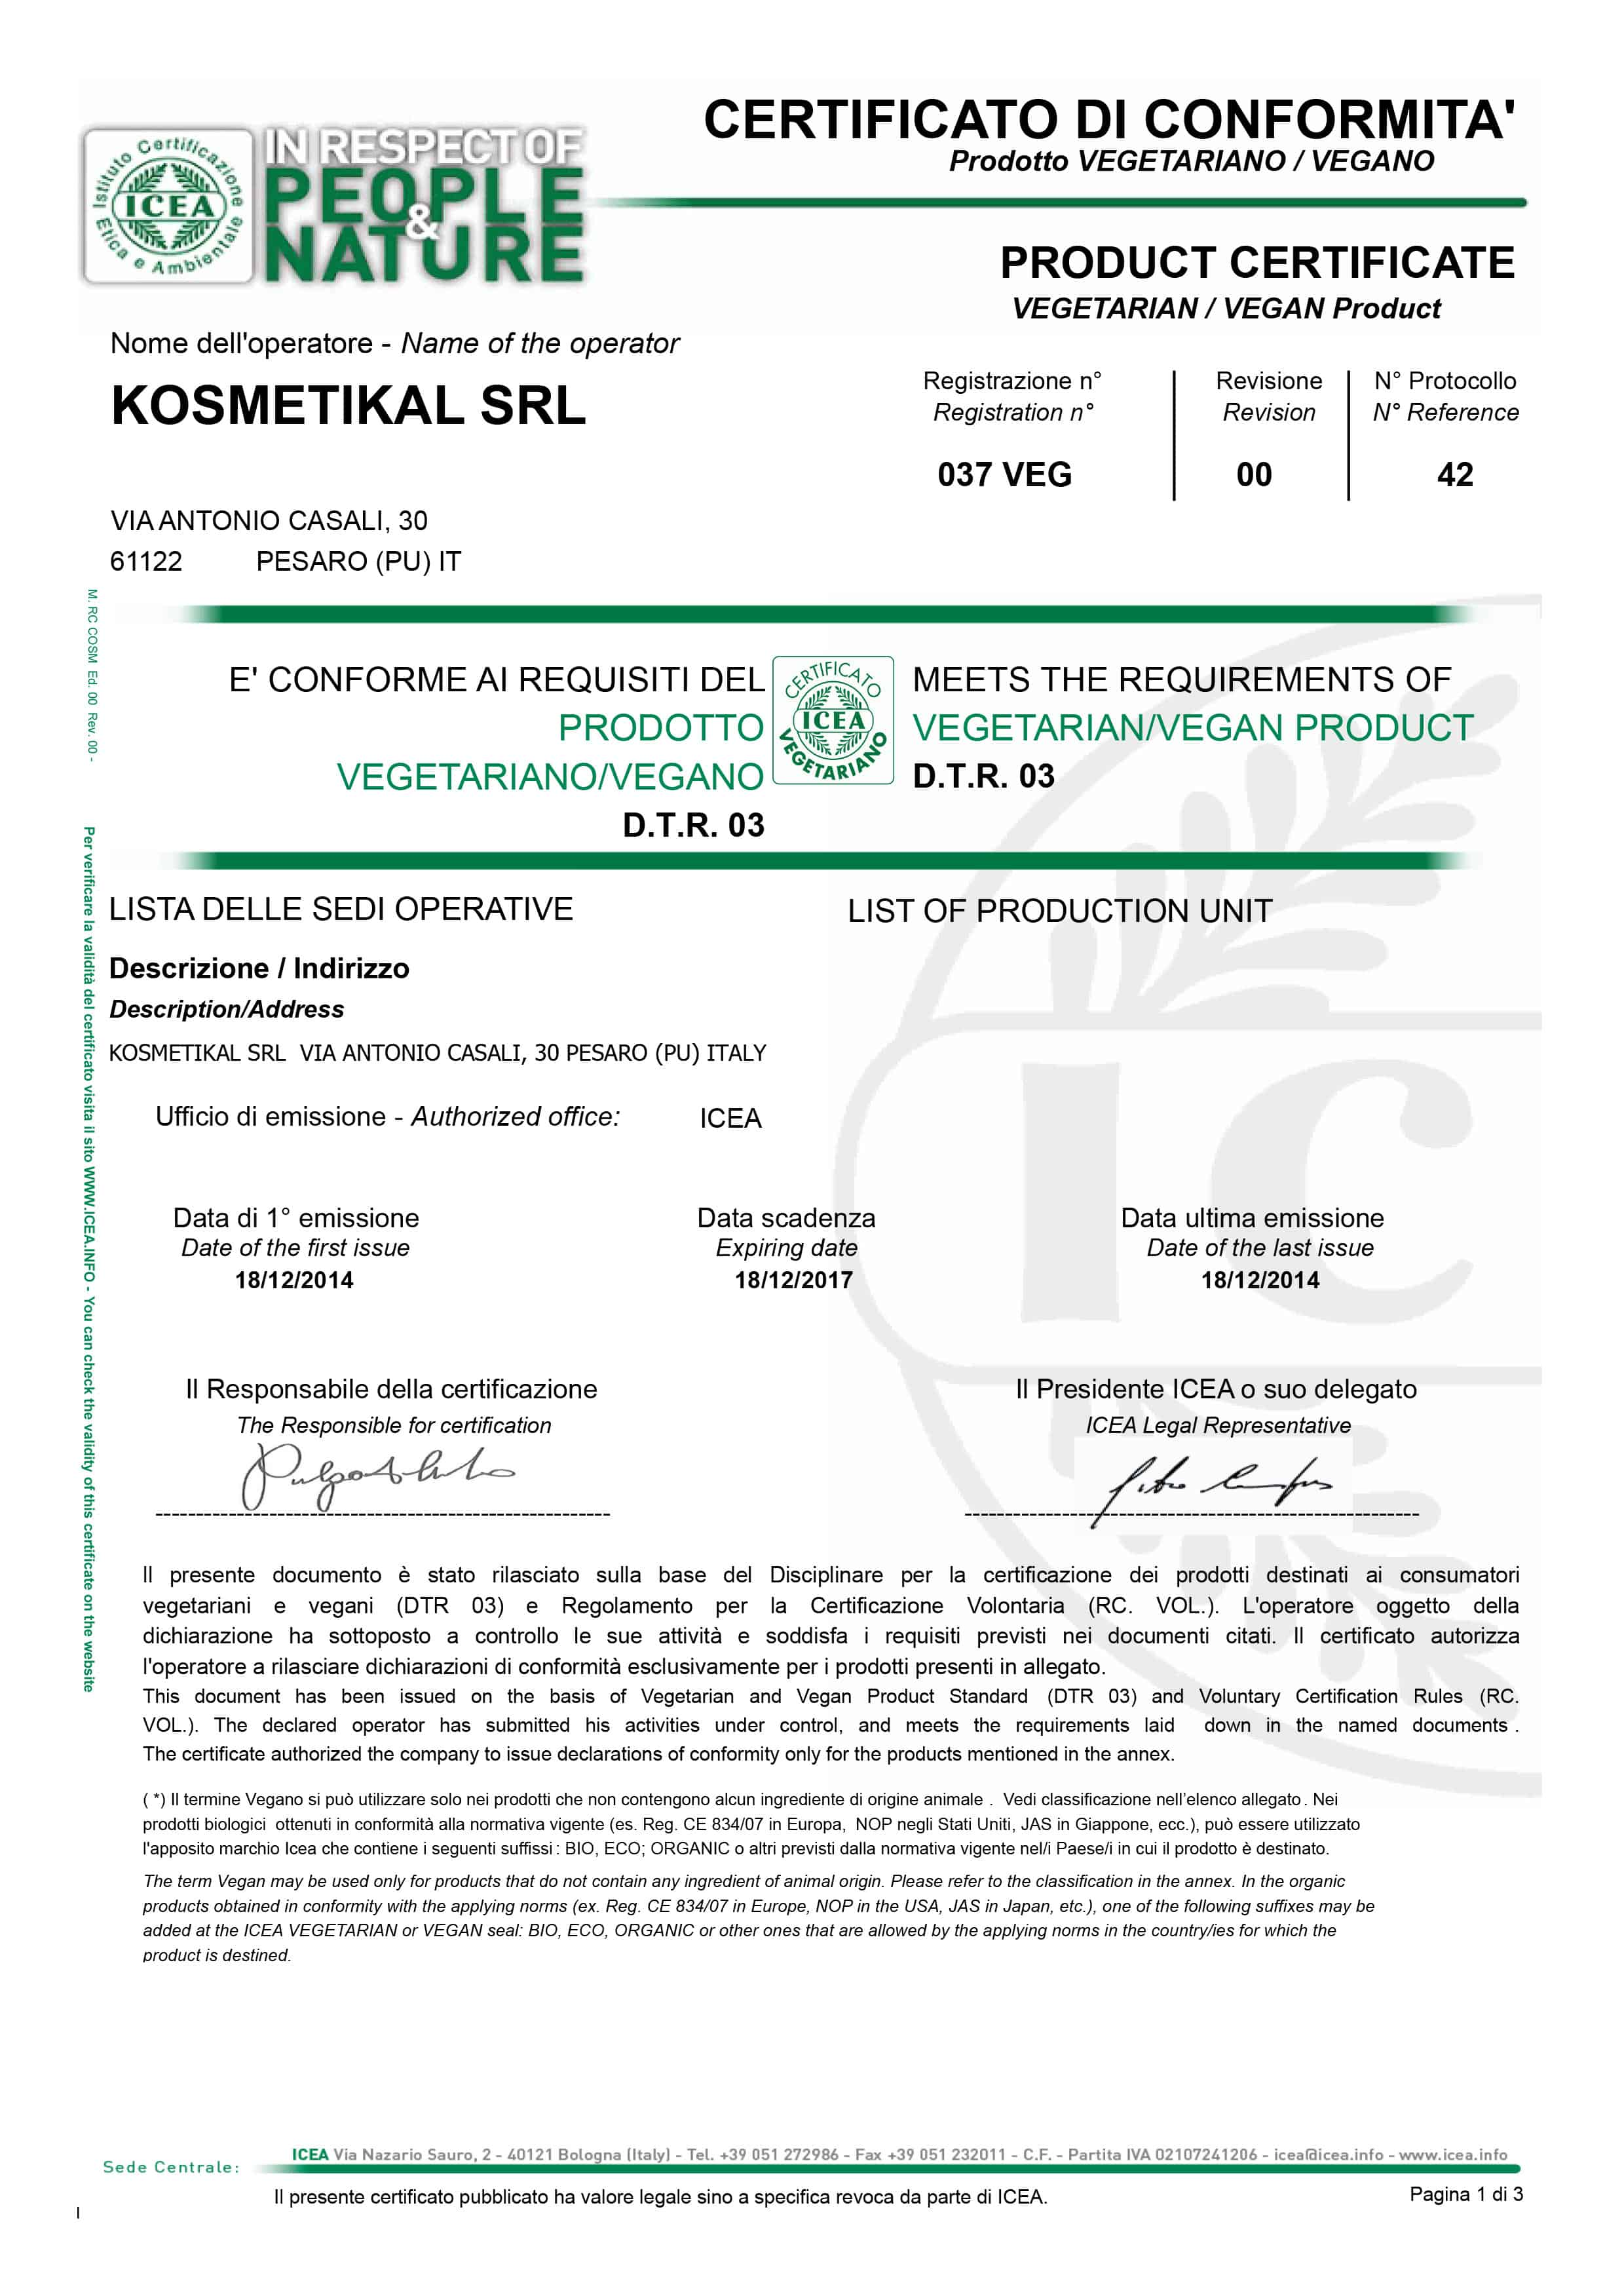 Kosmetikal produce cosmetici vegani certificati